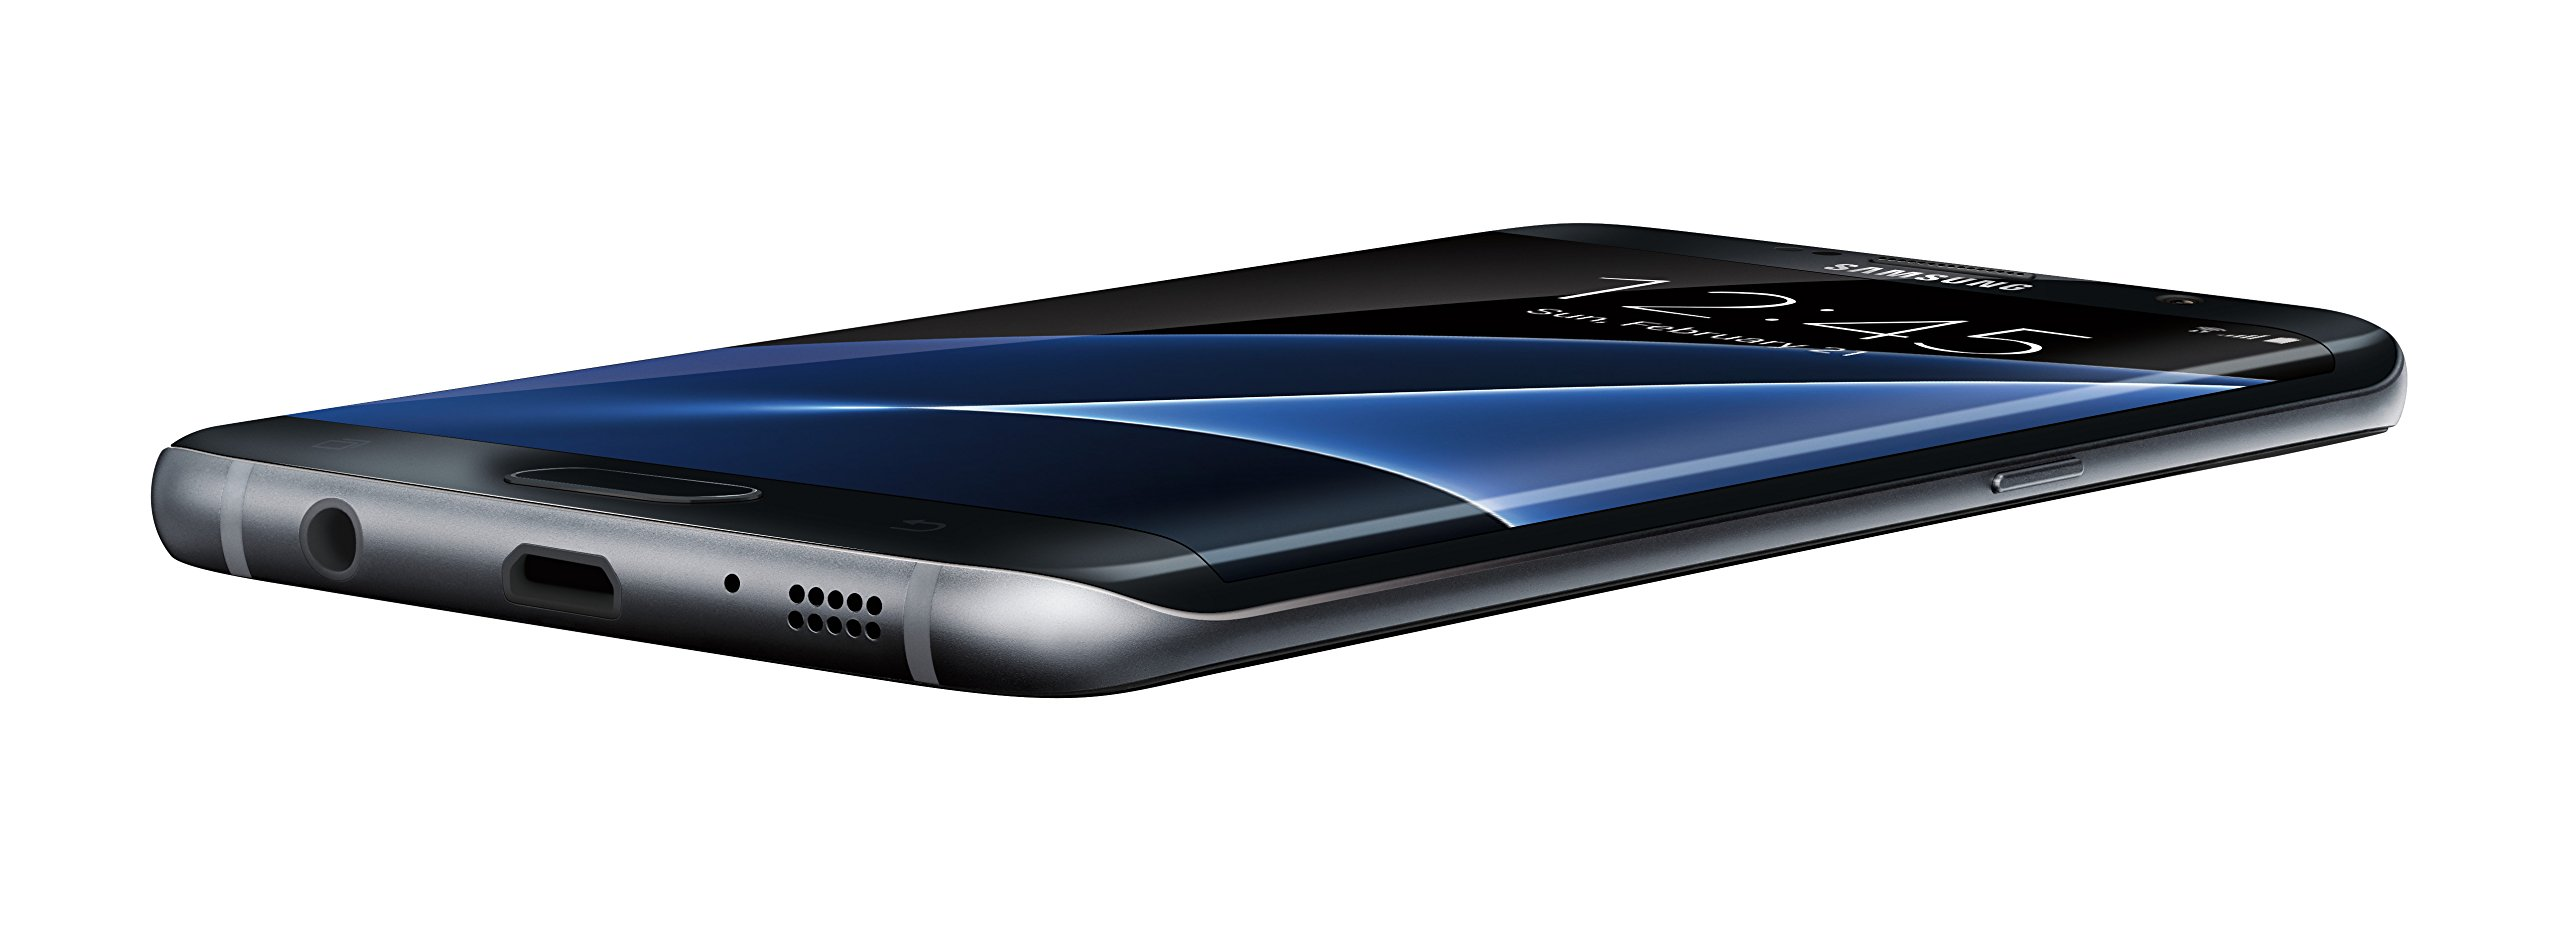 Samsung Galaxy S7 Edge G935F Factory Unlocked Phone 32 GB, No Warranty - International Version (Black Onyx) by Samsung (Image #7)